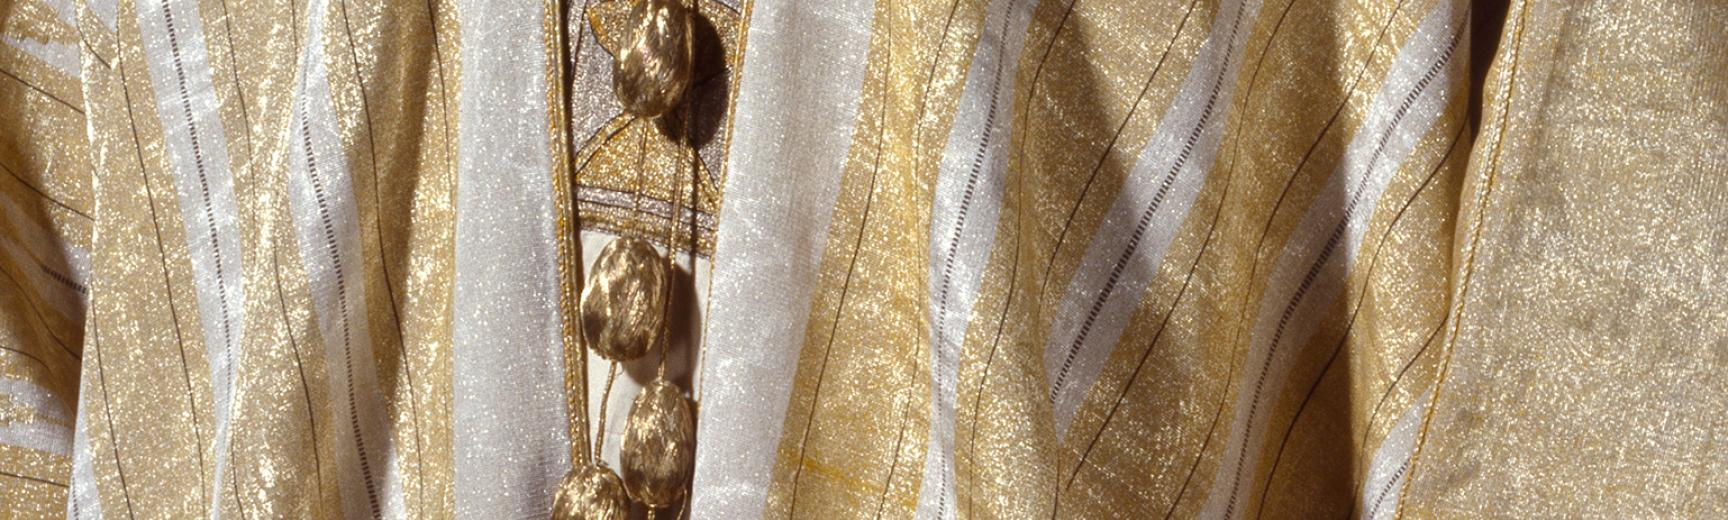 Arab robe worn by T. E. Lawrence